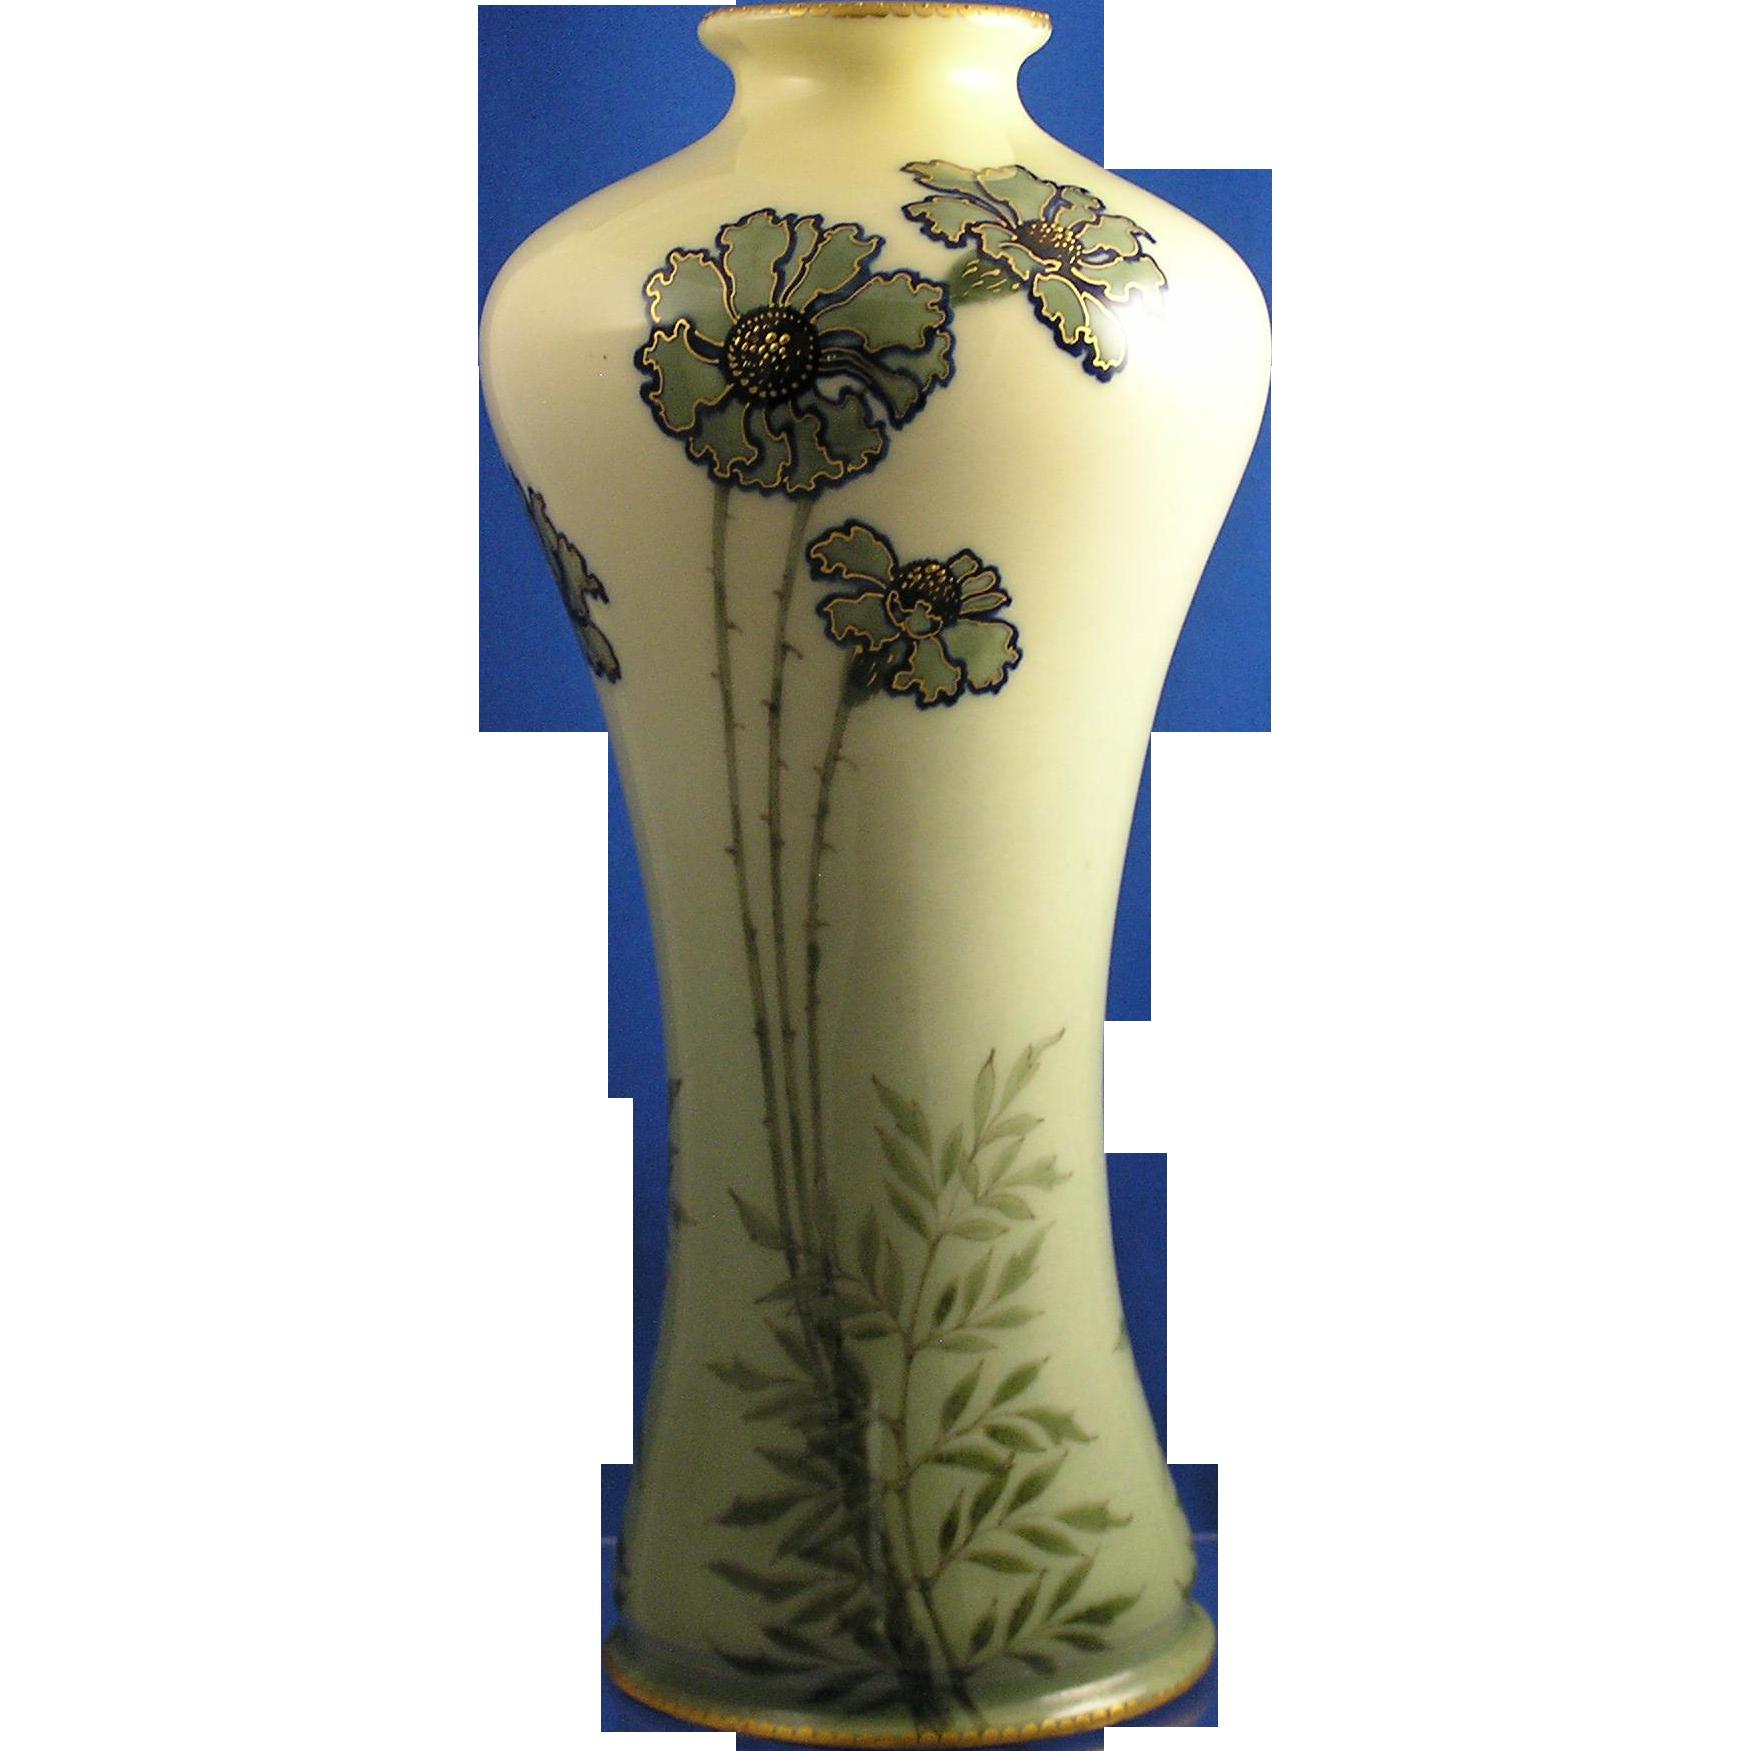 Amphora Austria Ernst Wahliss Arts & Crafts Blue & Green Floral Vase (c.1900-1918)